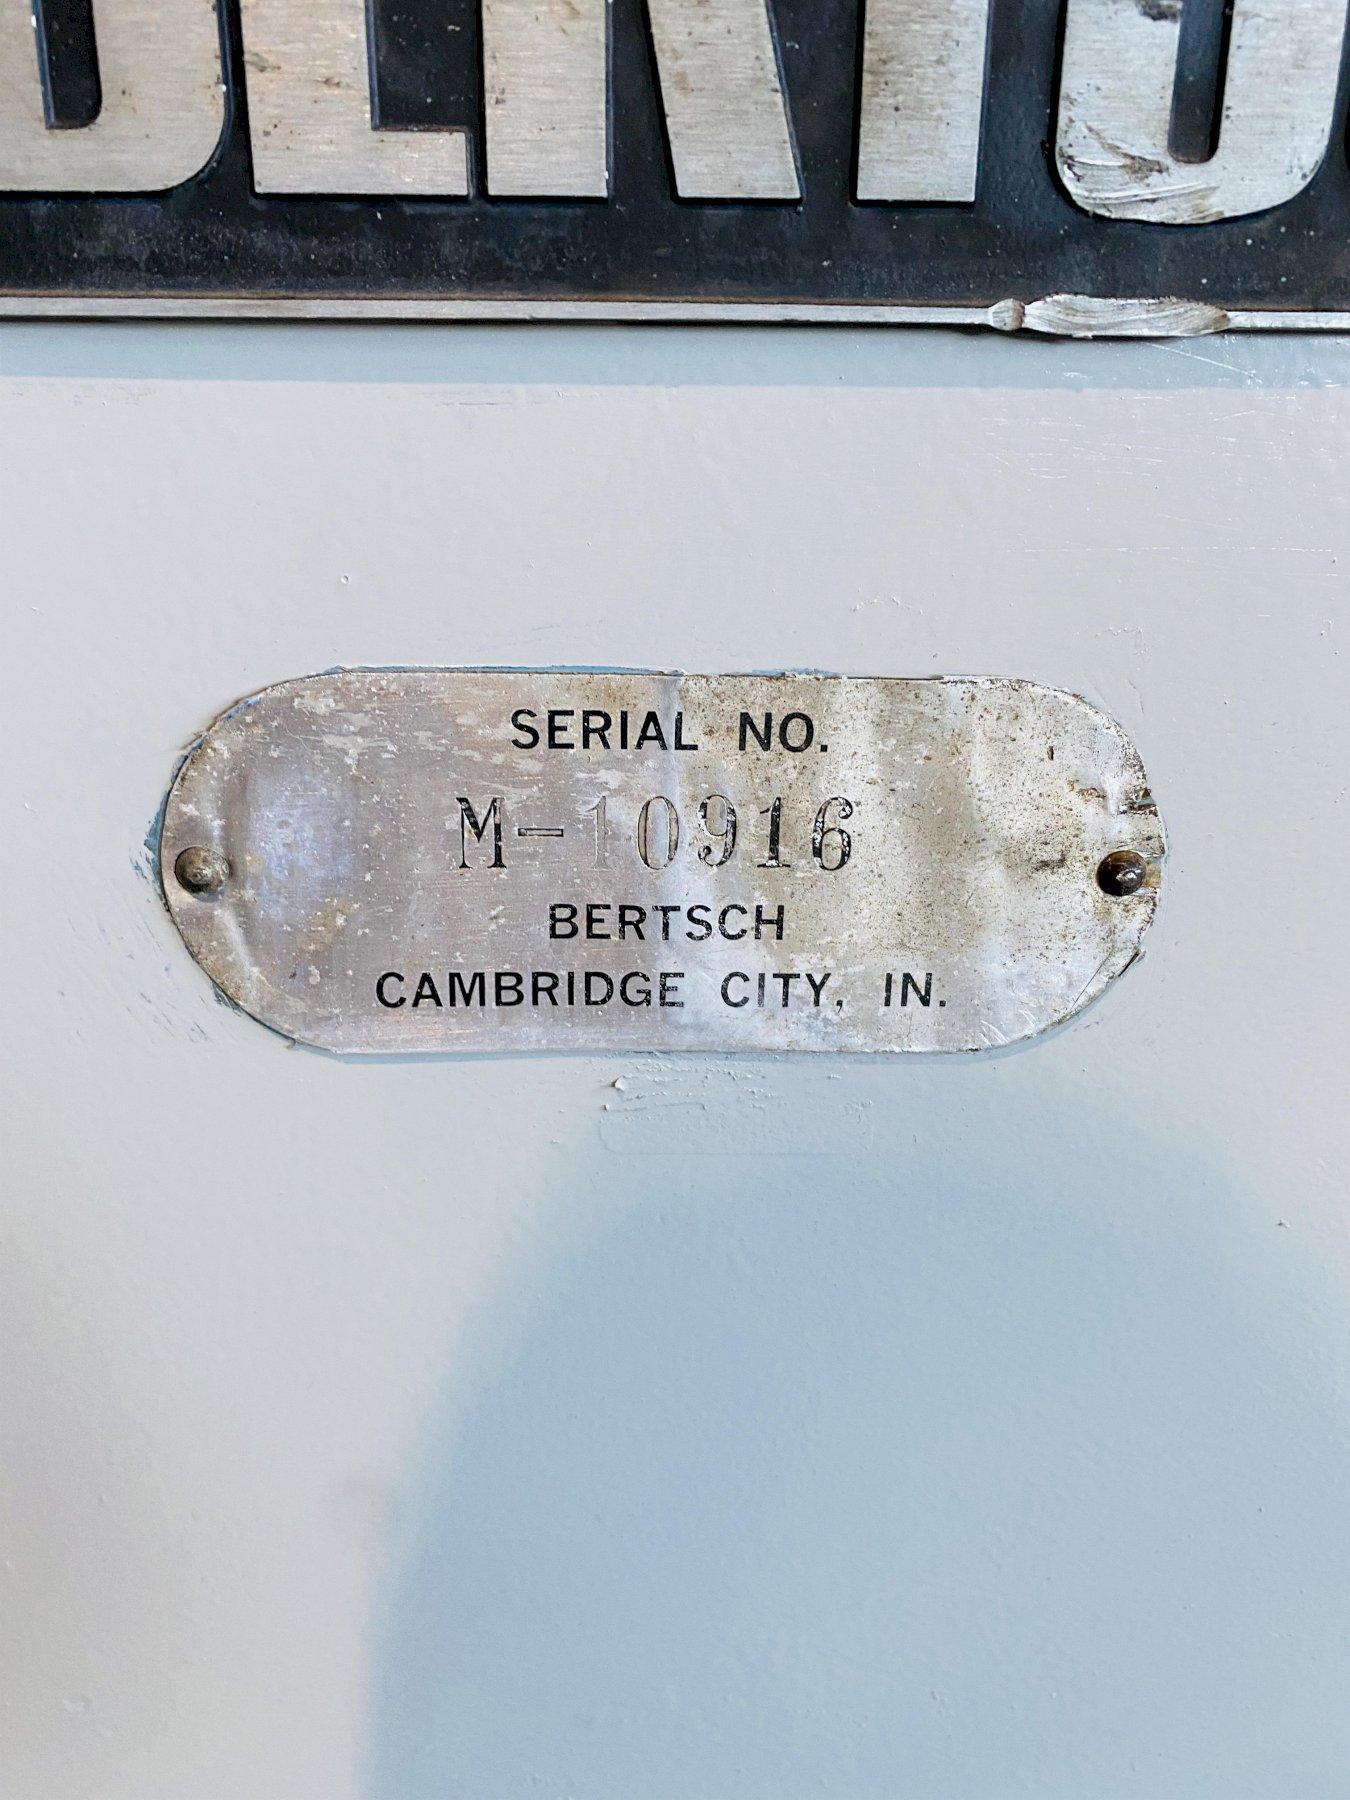 "10' x 1/2"" BERTSCH 50-10 4 ROLL DOUBLE INITIAL PINCH HYDRAULIC PLATE ROLL. STOCK # 0308321"